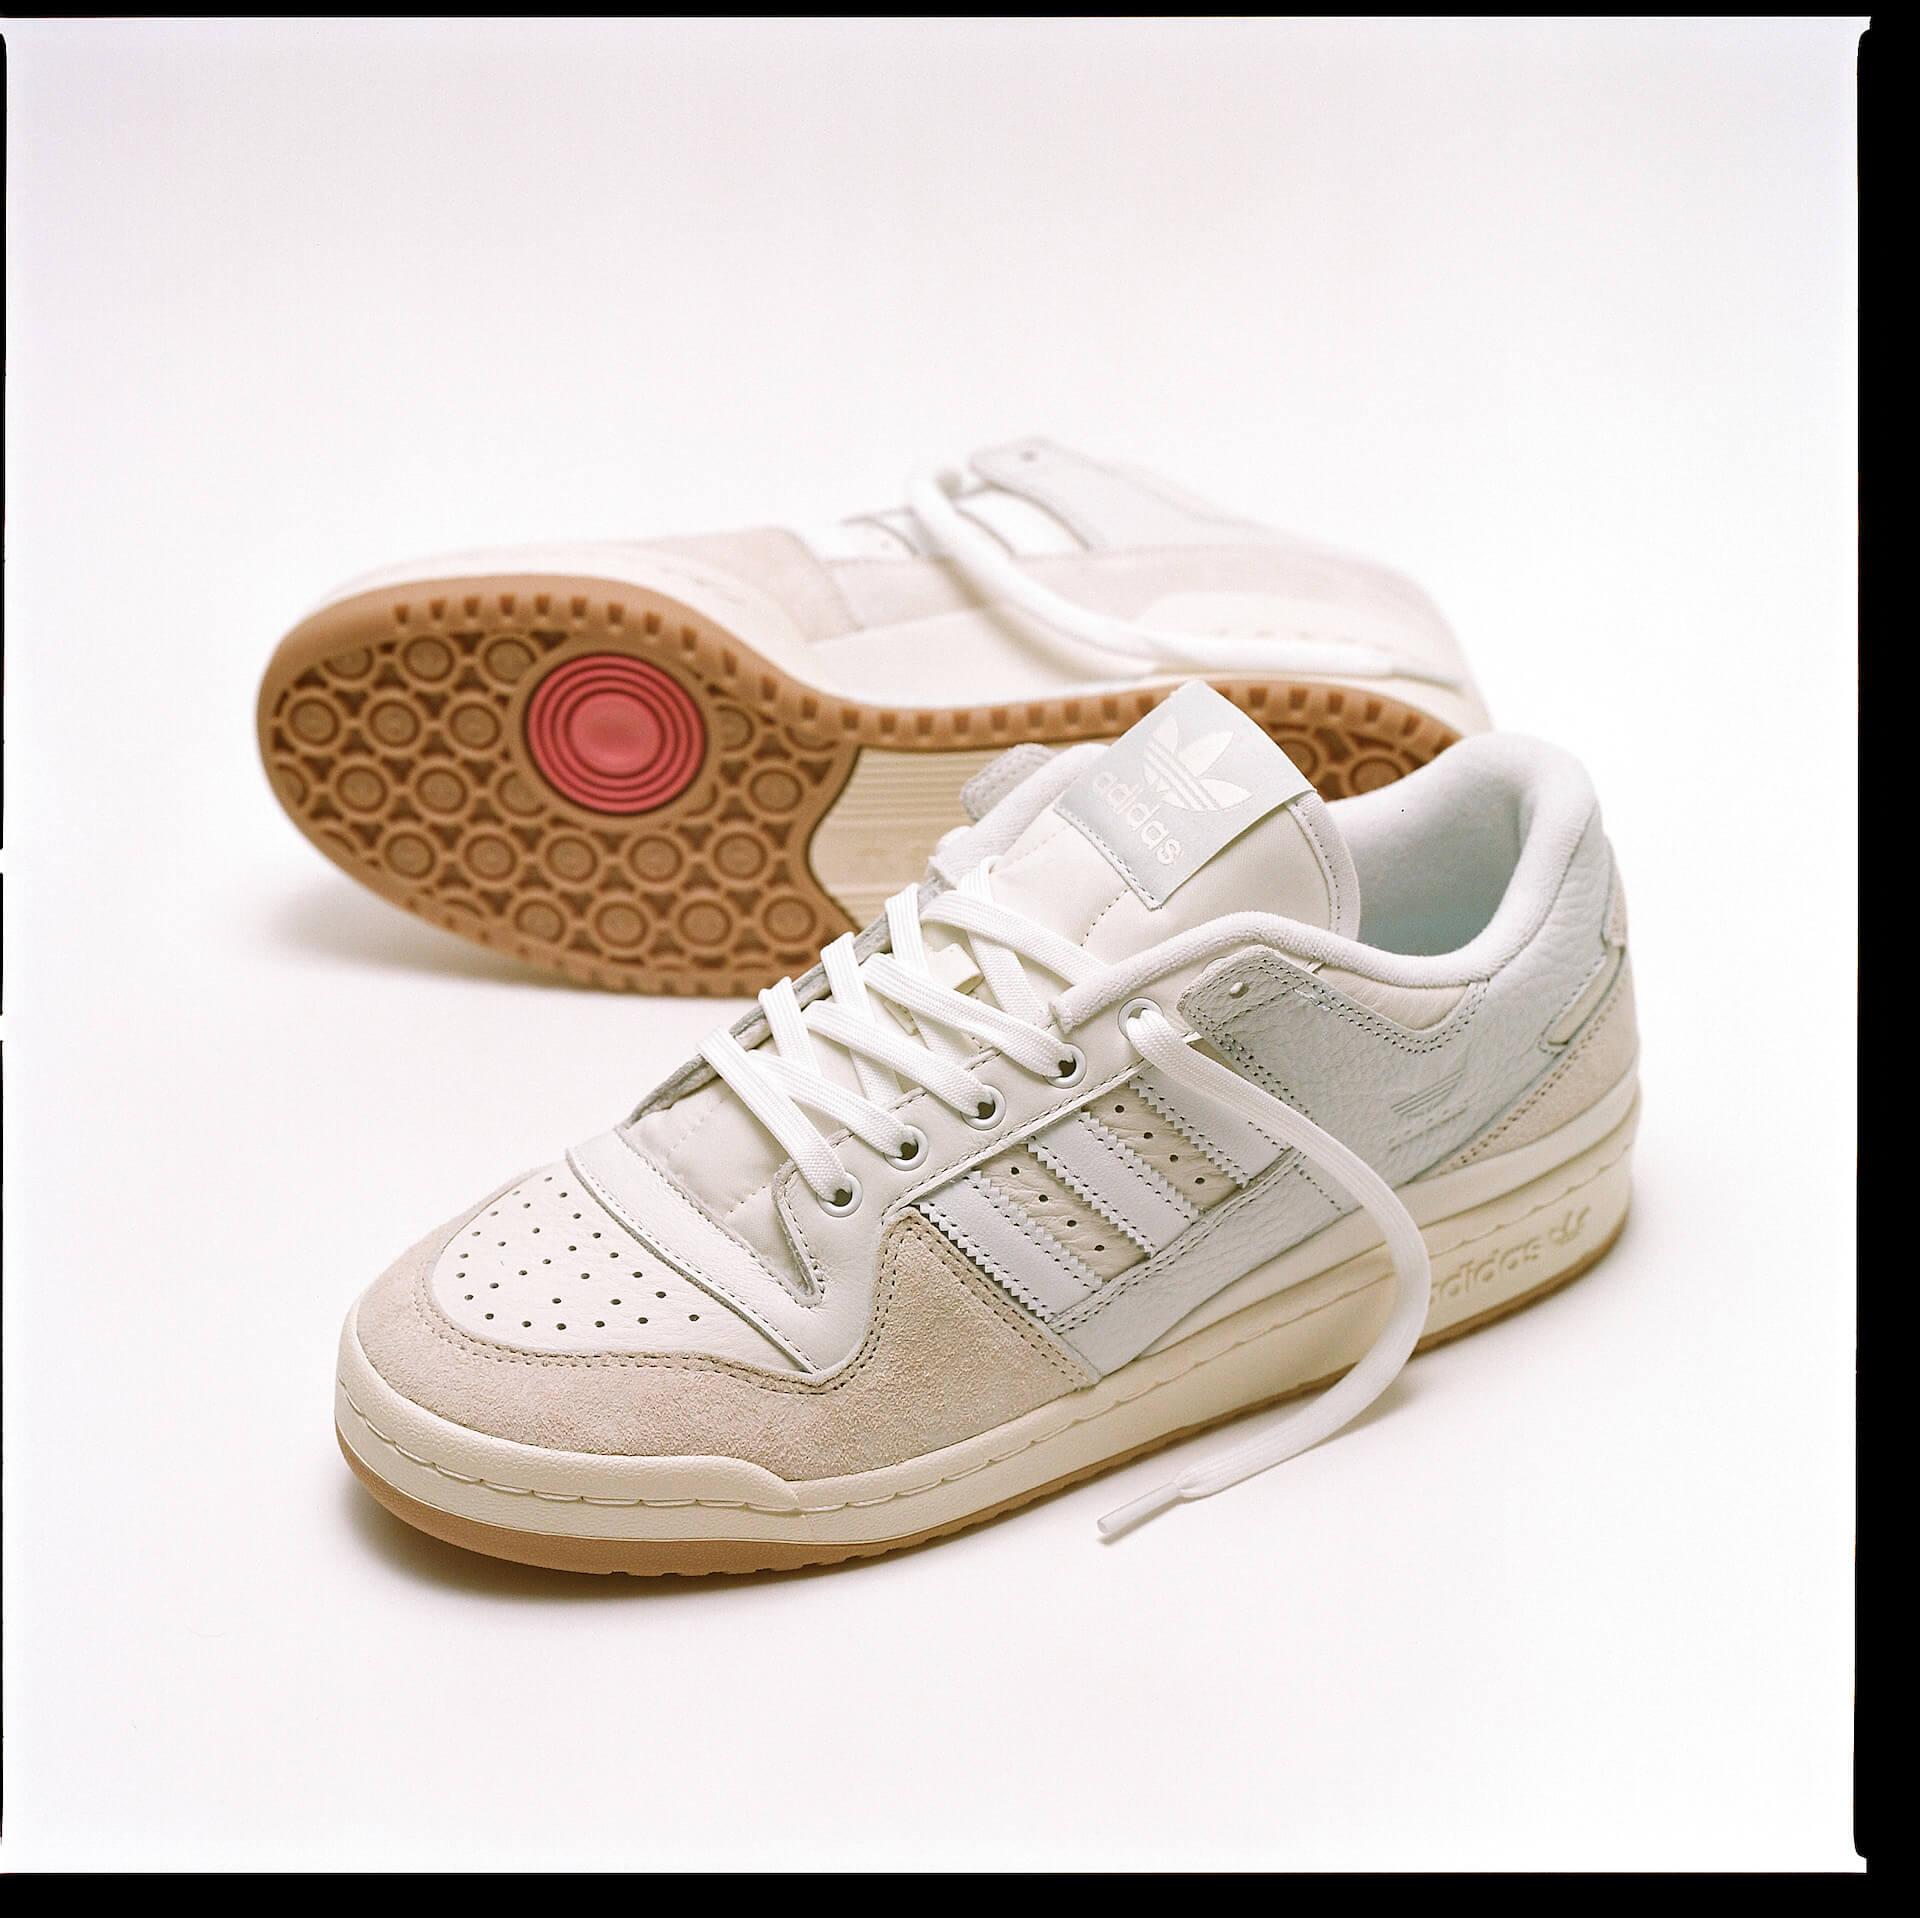 adidas Skateboarding「FORUM 84 ADV」に春夏仕様の新色が登場!チョークホワイト&ブラックの2色 life210324_adidasskateboarding_5